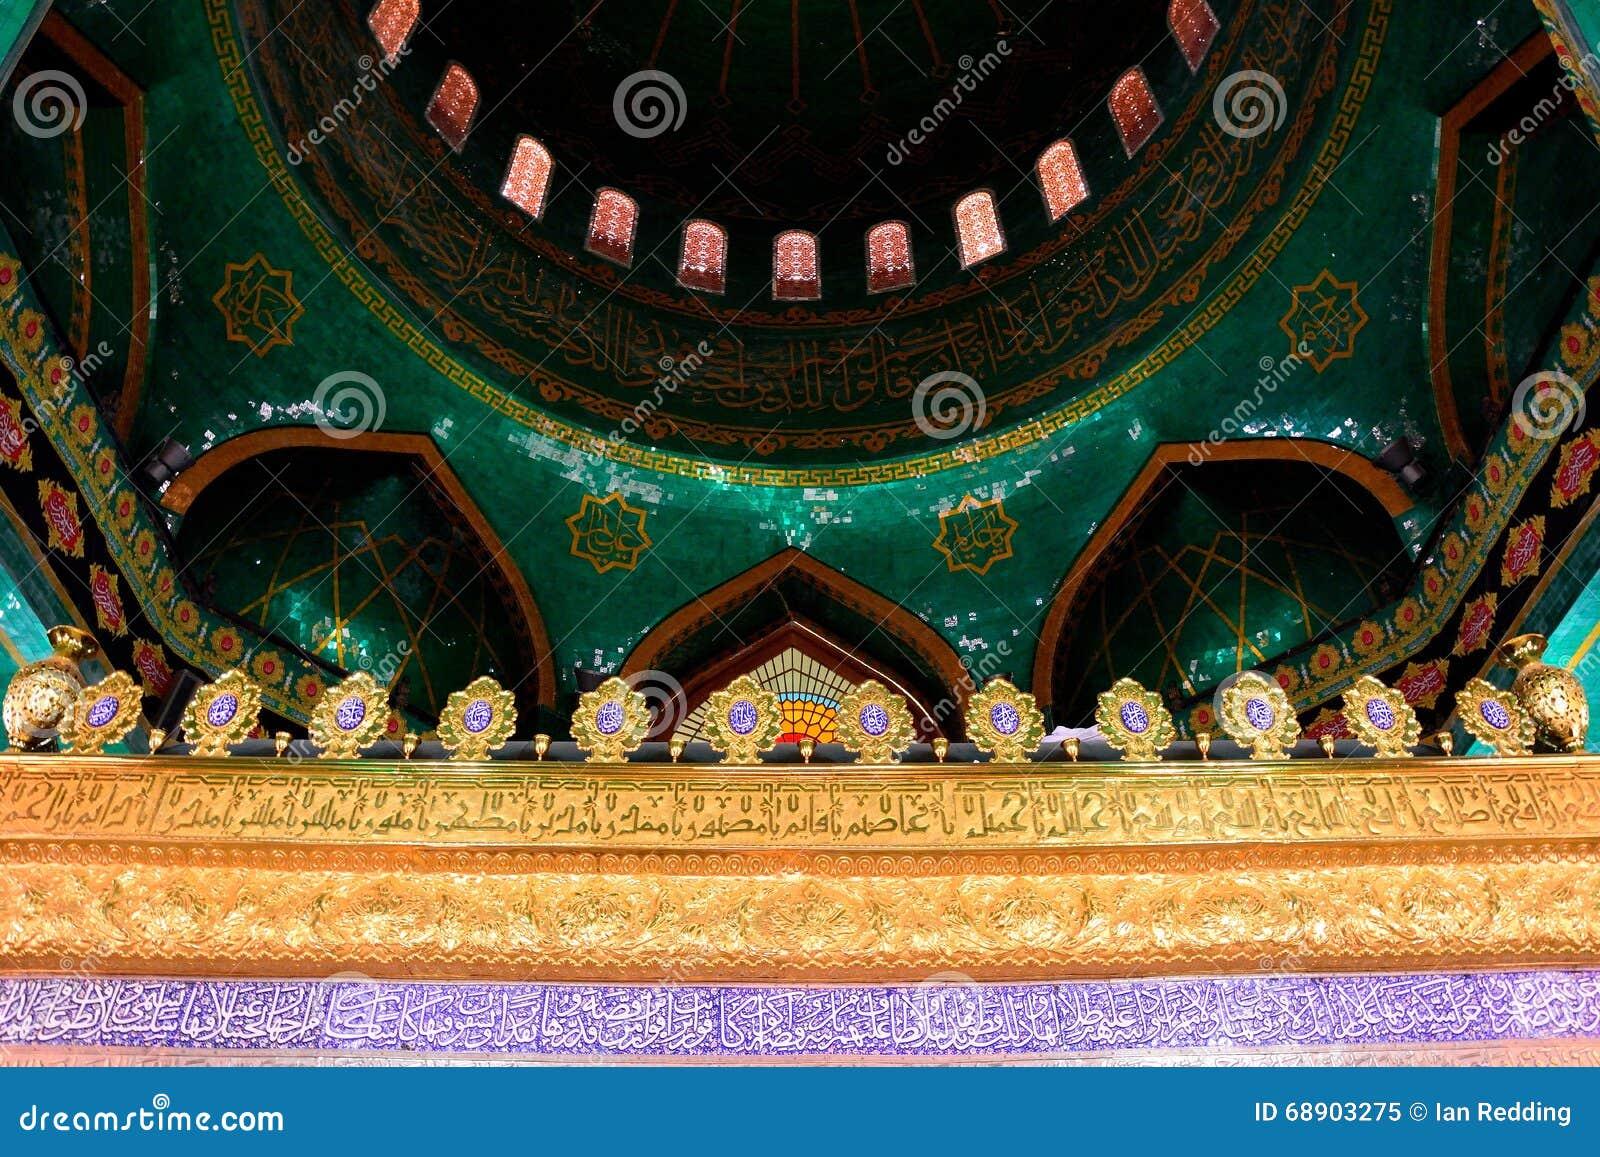 Looking up inside Bibiheybat Mosque